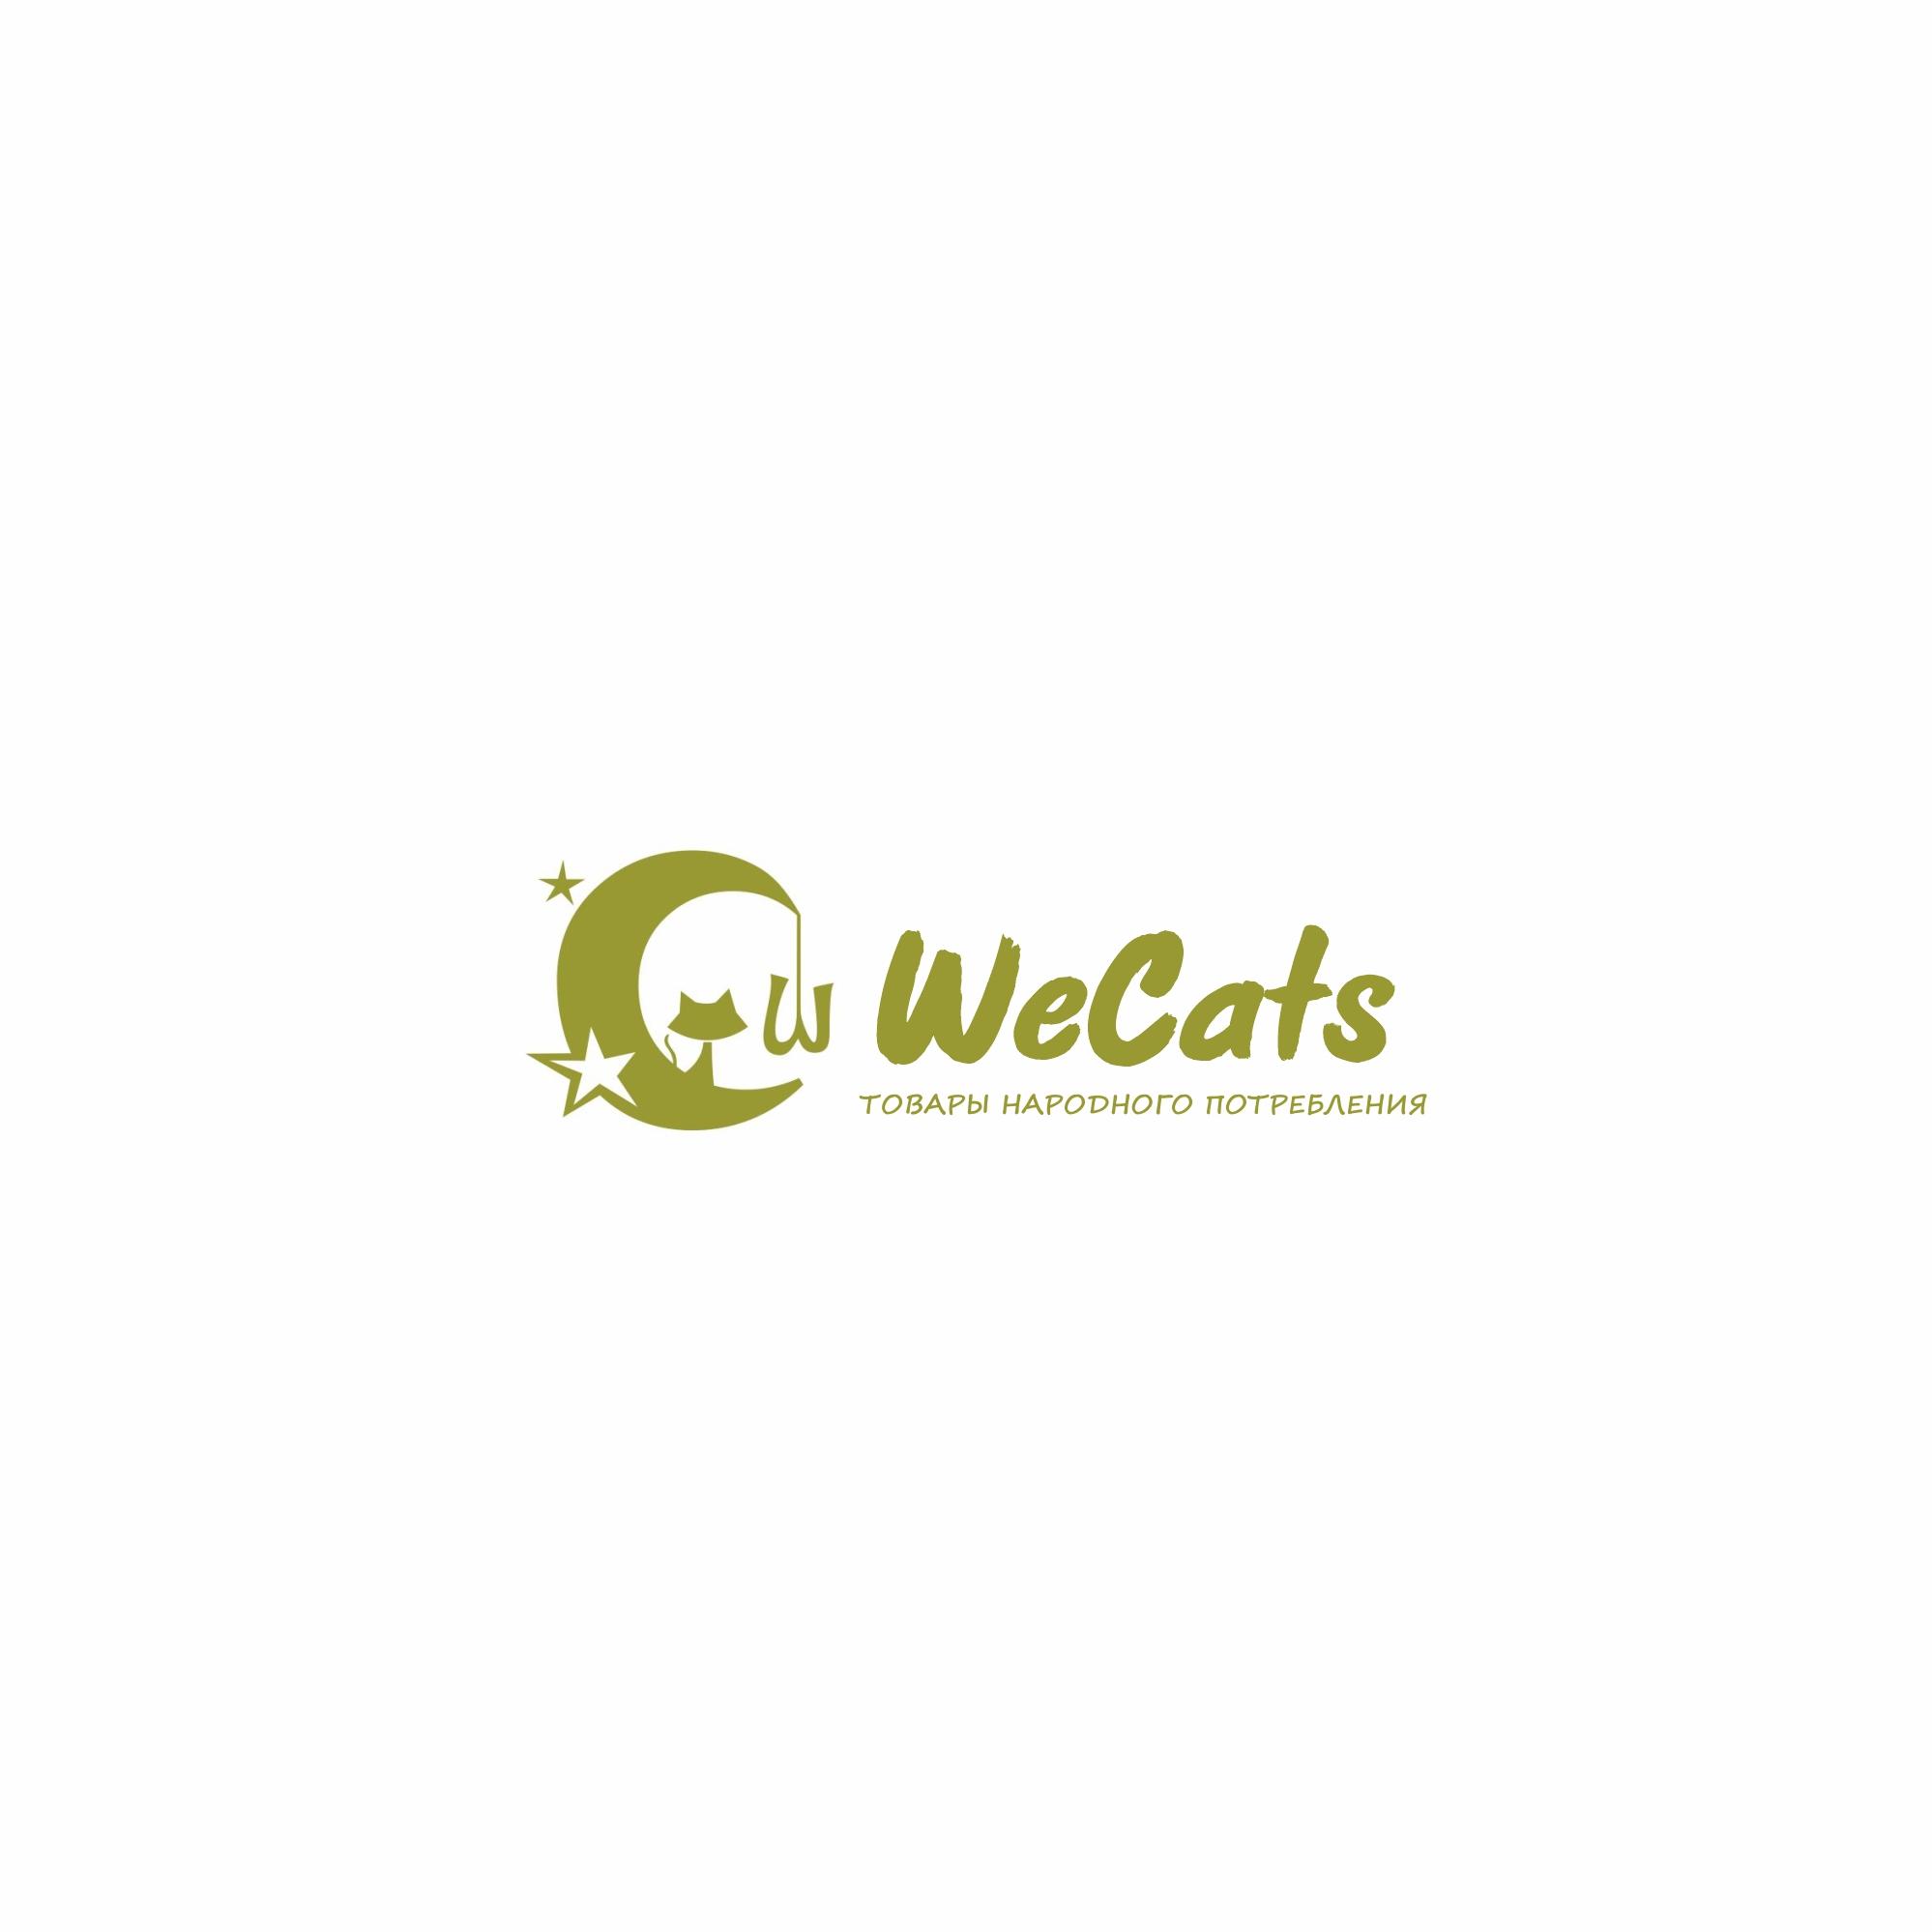 Создание логотипа WeCats фото f_8995f1977d2ab9f0.jpg